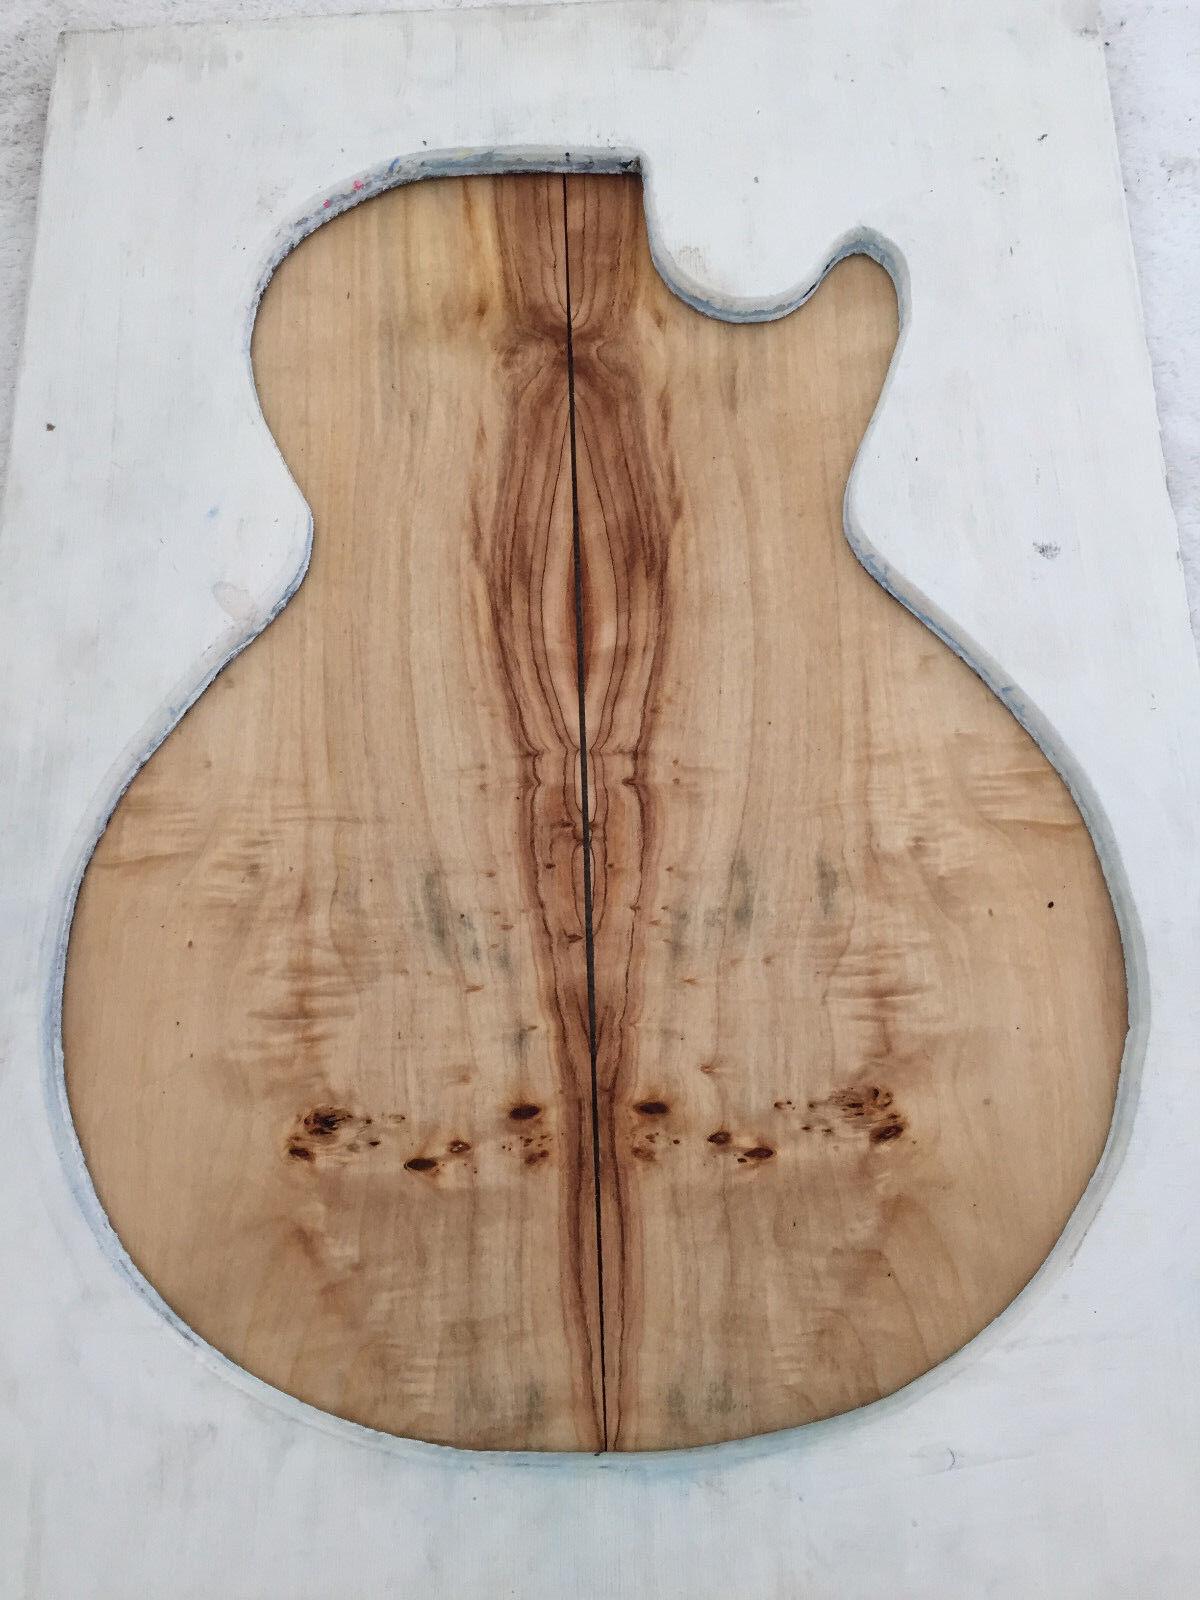 Poplar Burl Guitar Bookmatch Set Musical Luthier tone wood .31 x 15 x 20